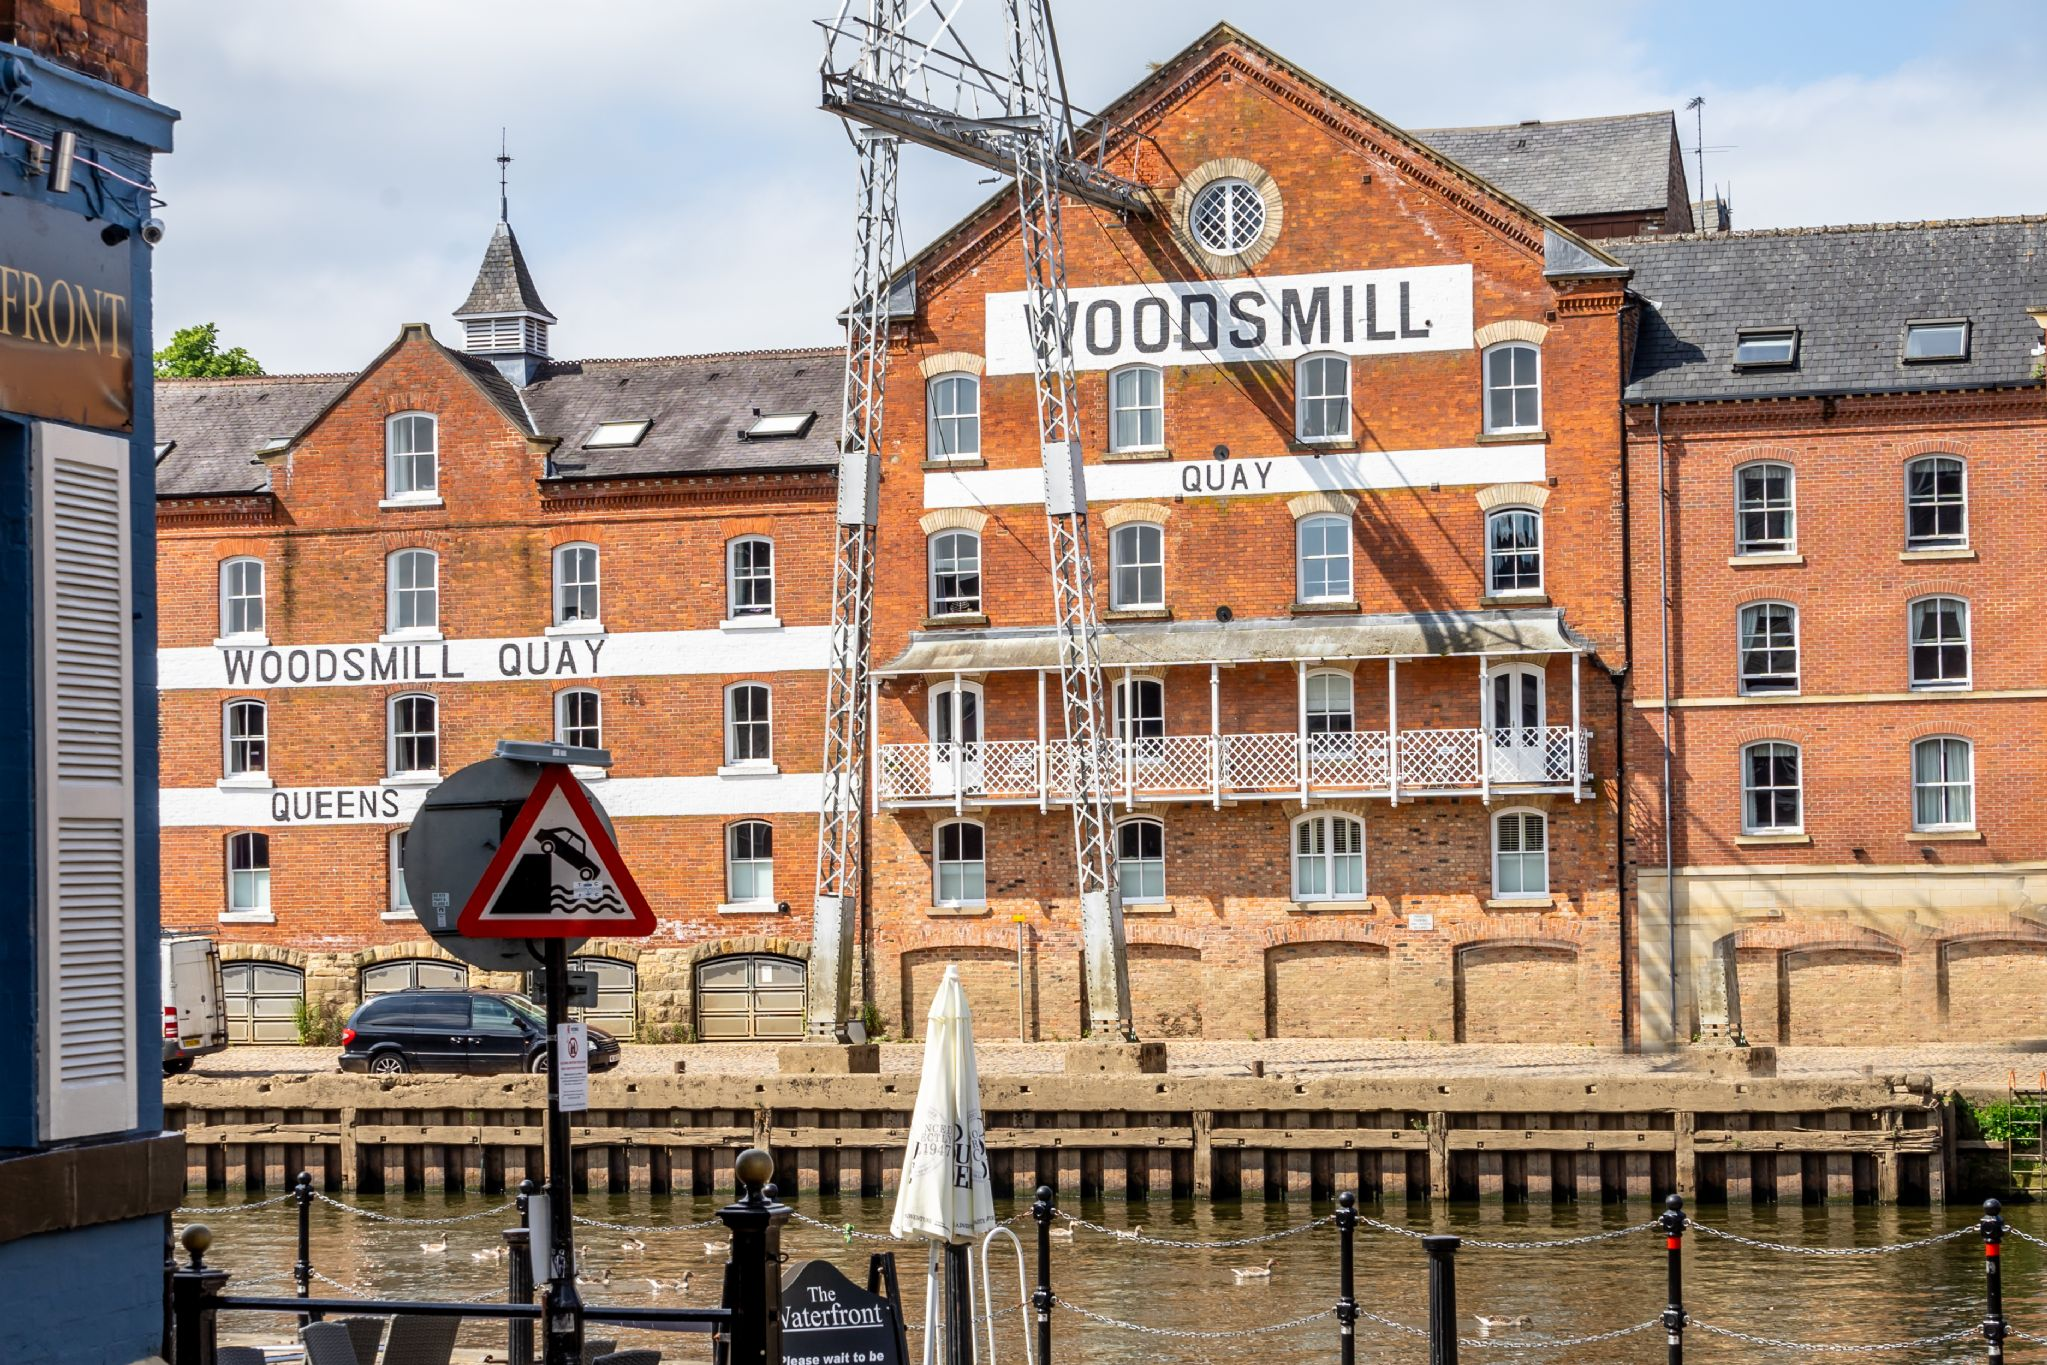 30 Woodsmill Quay